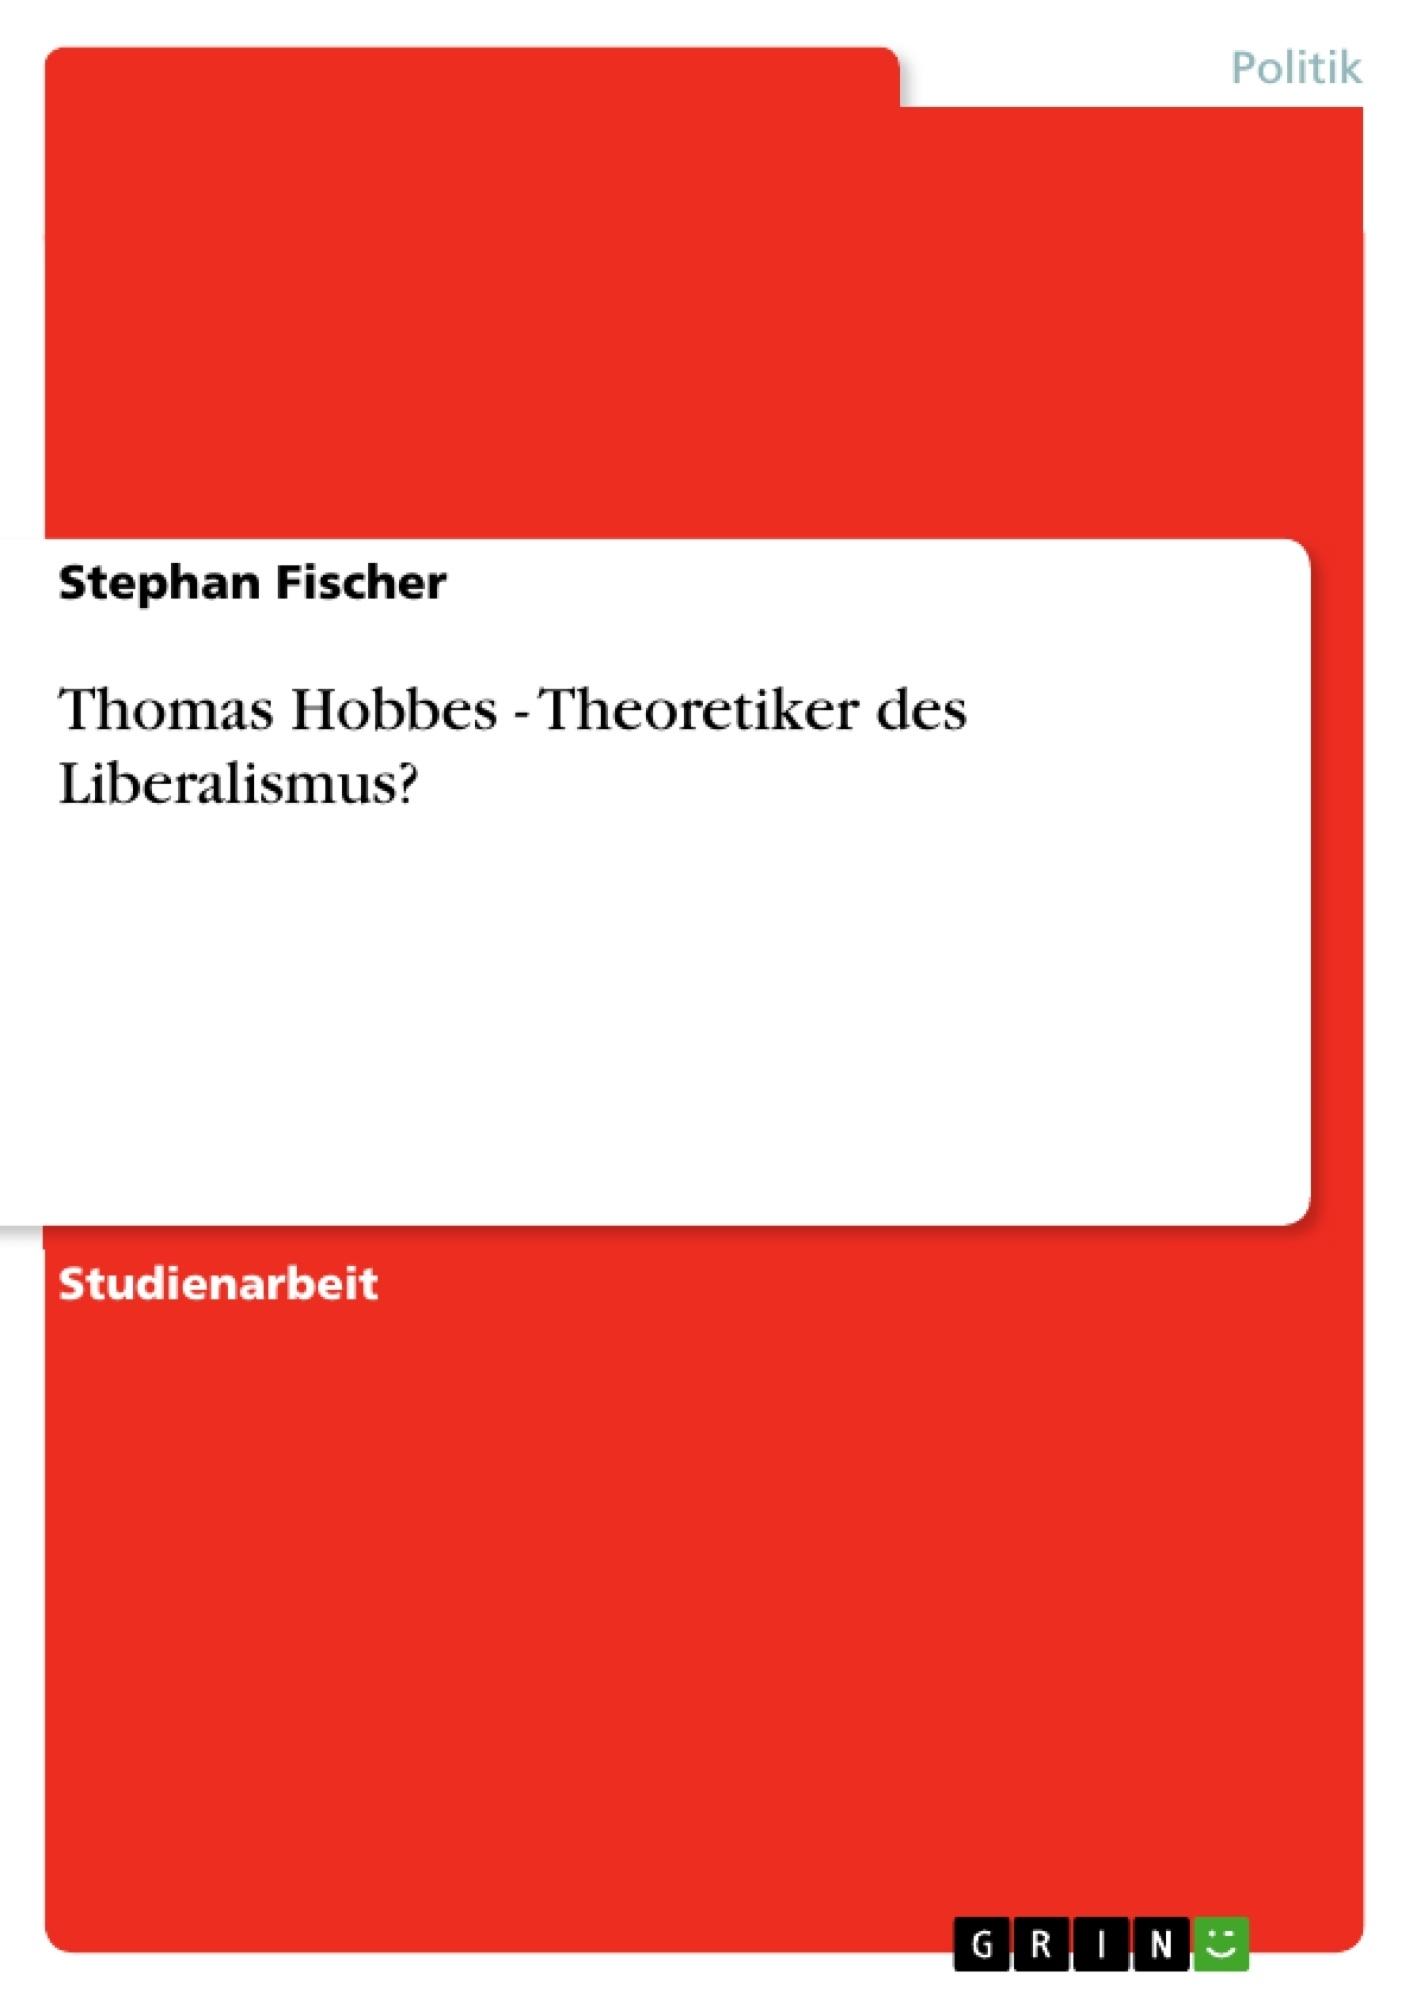 Titel: Thomas Hobbes - Theoretiker des Liberalismus?